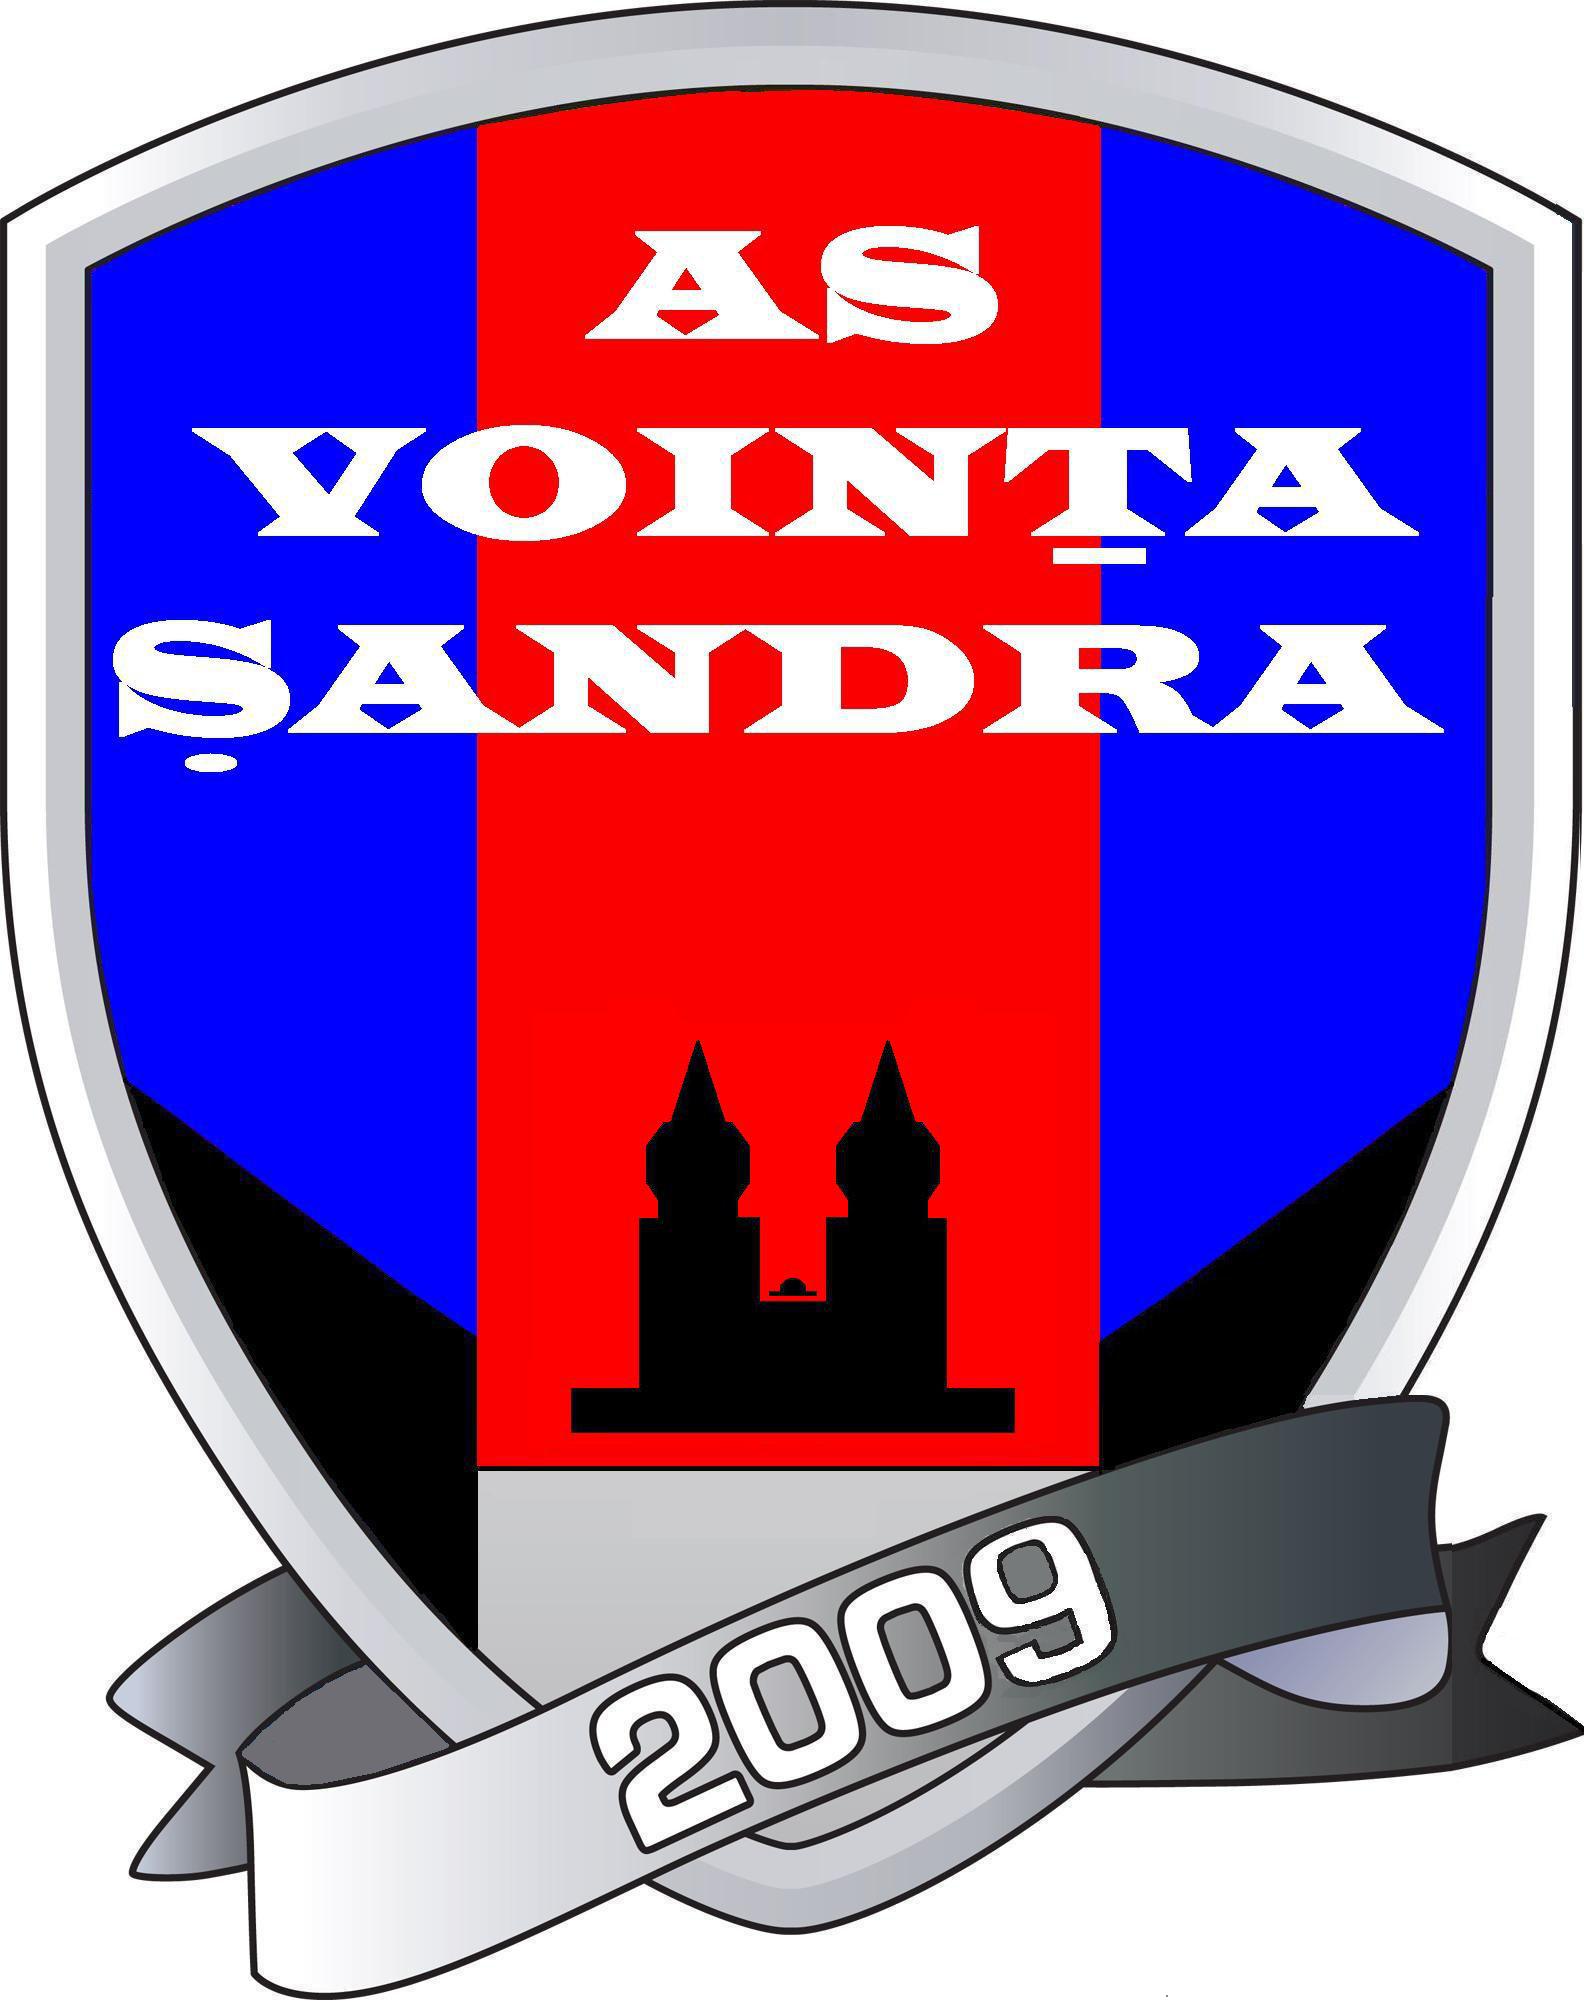 AS VOINTA SANDRA